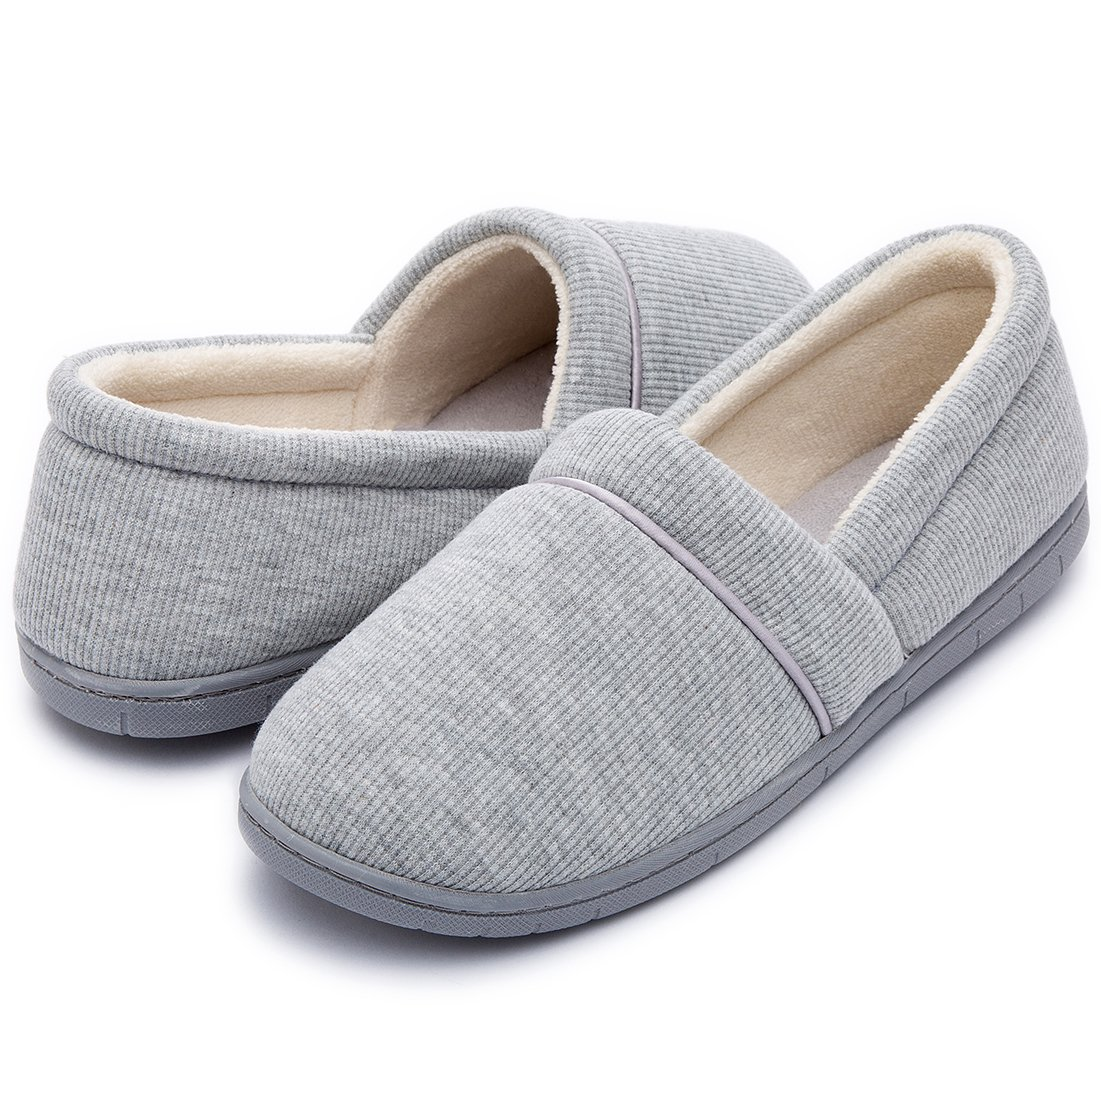 ULTRAIDEAS Women's Velvet Memory Foam Closed Back Slippers Lightweight Anti Slid Embroidery Ballerina House Office Shoes